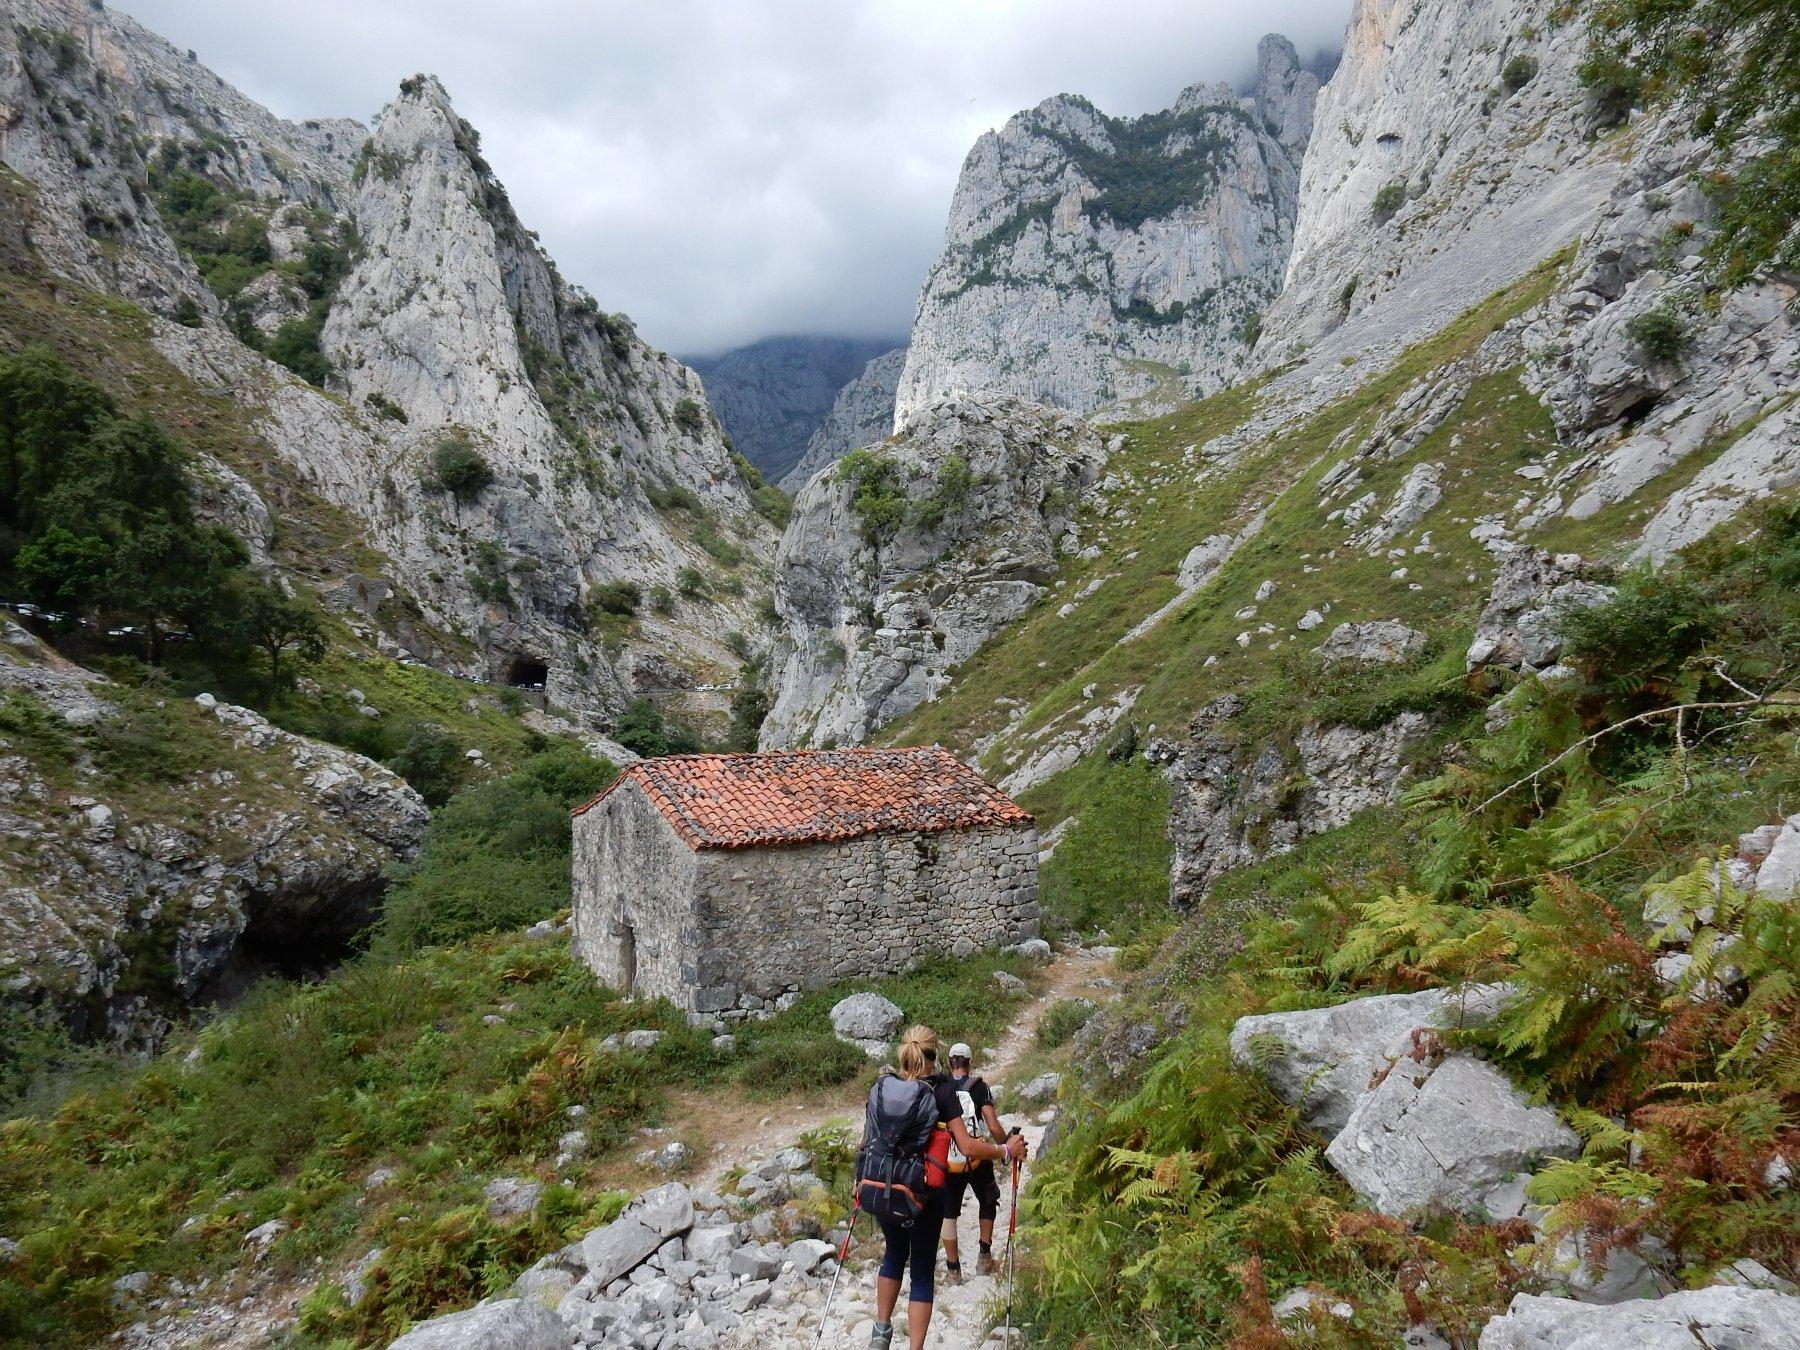 Picos de Europa (Anillo) tappa 8: dal Refugio Vega de Urriellu a Puente Poncebos 2018-08-14